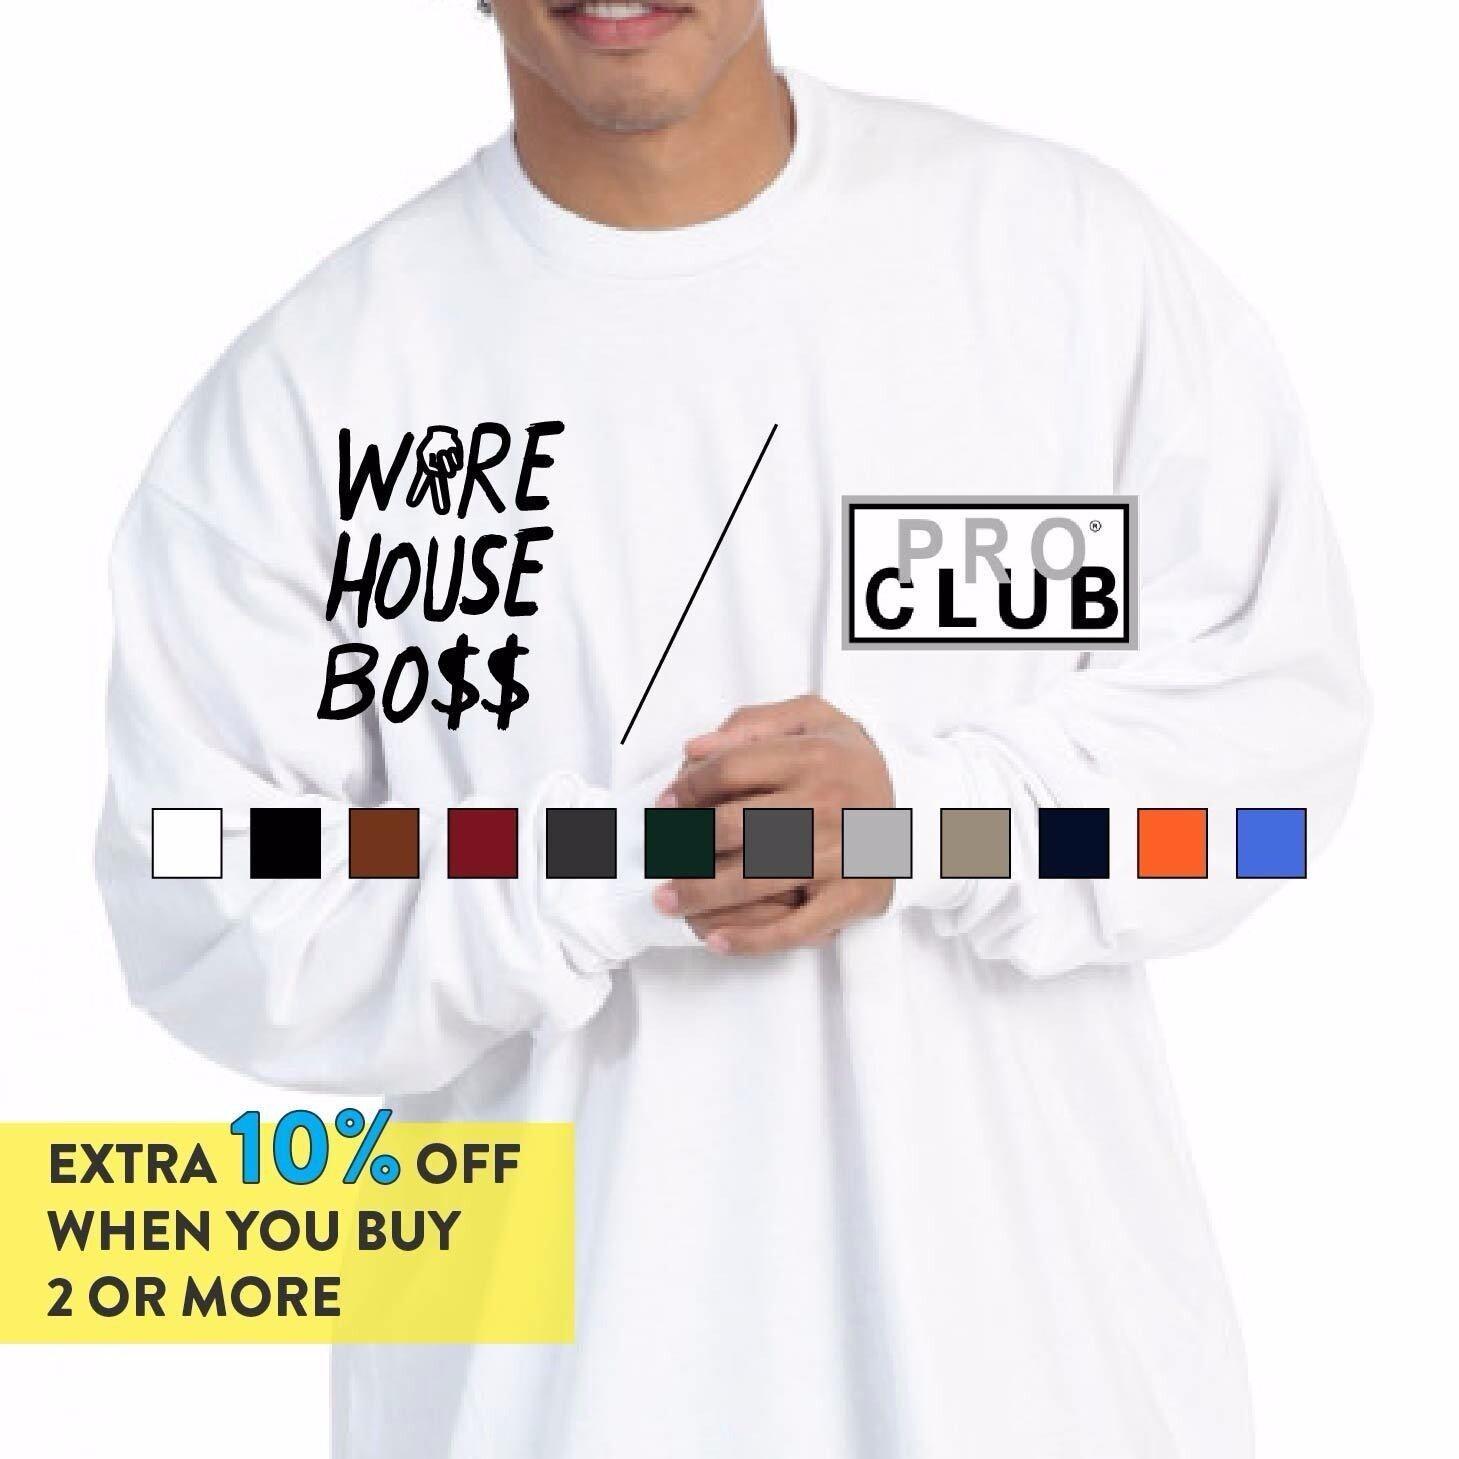 3806361ebb7a Pro Club Shirts Ebay - Nils Stucki Kieferorthopäde